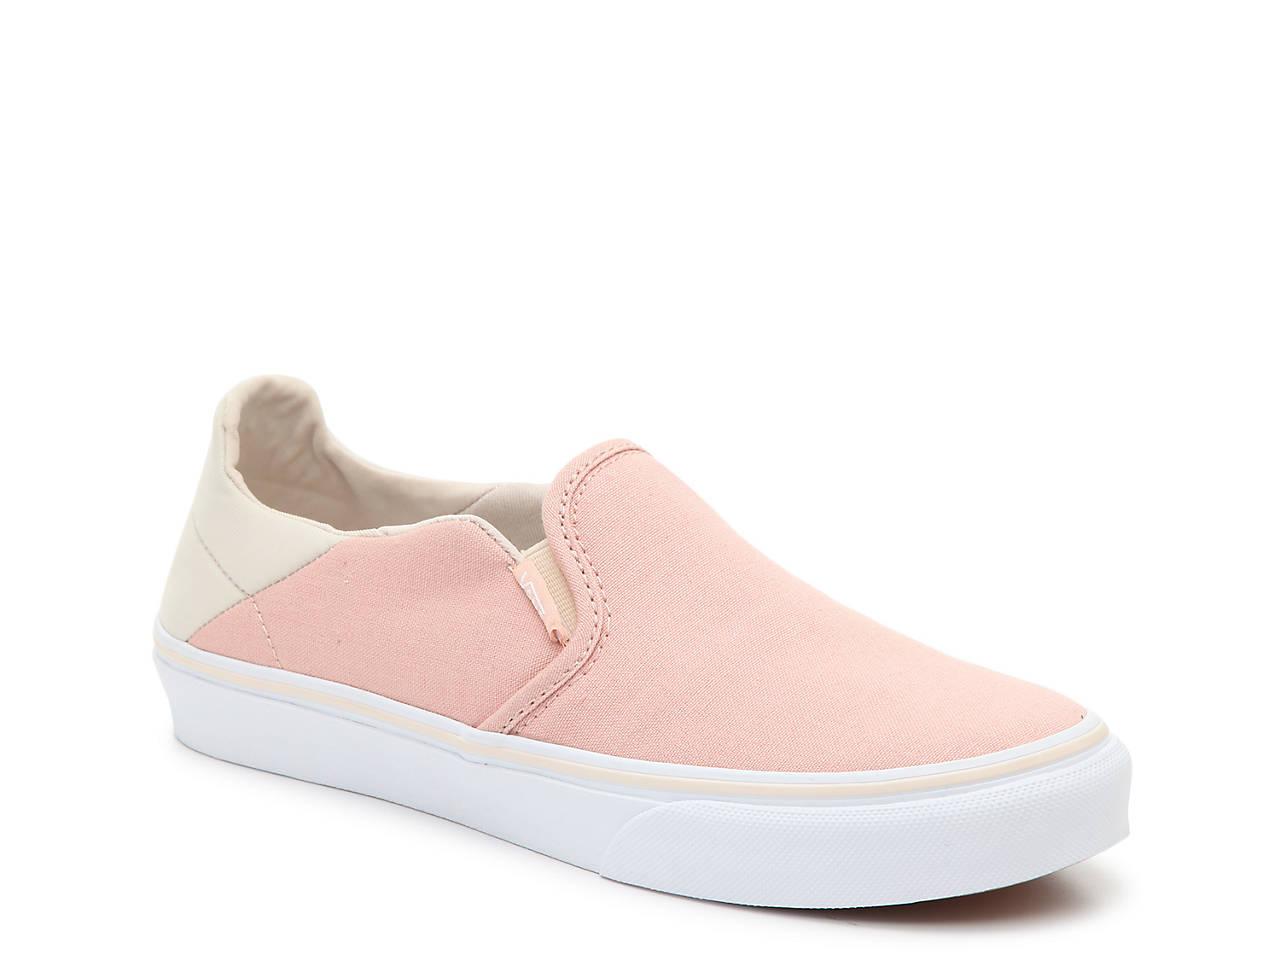 Vans Asher Flex Slip-On Sneaker - Women s Women s Shoes  269fa1d65